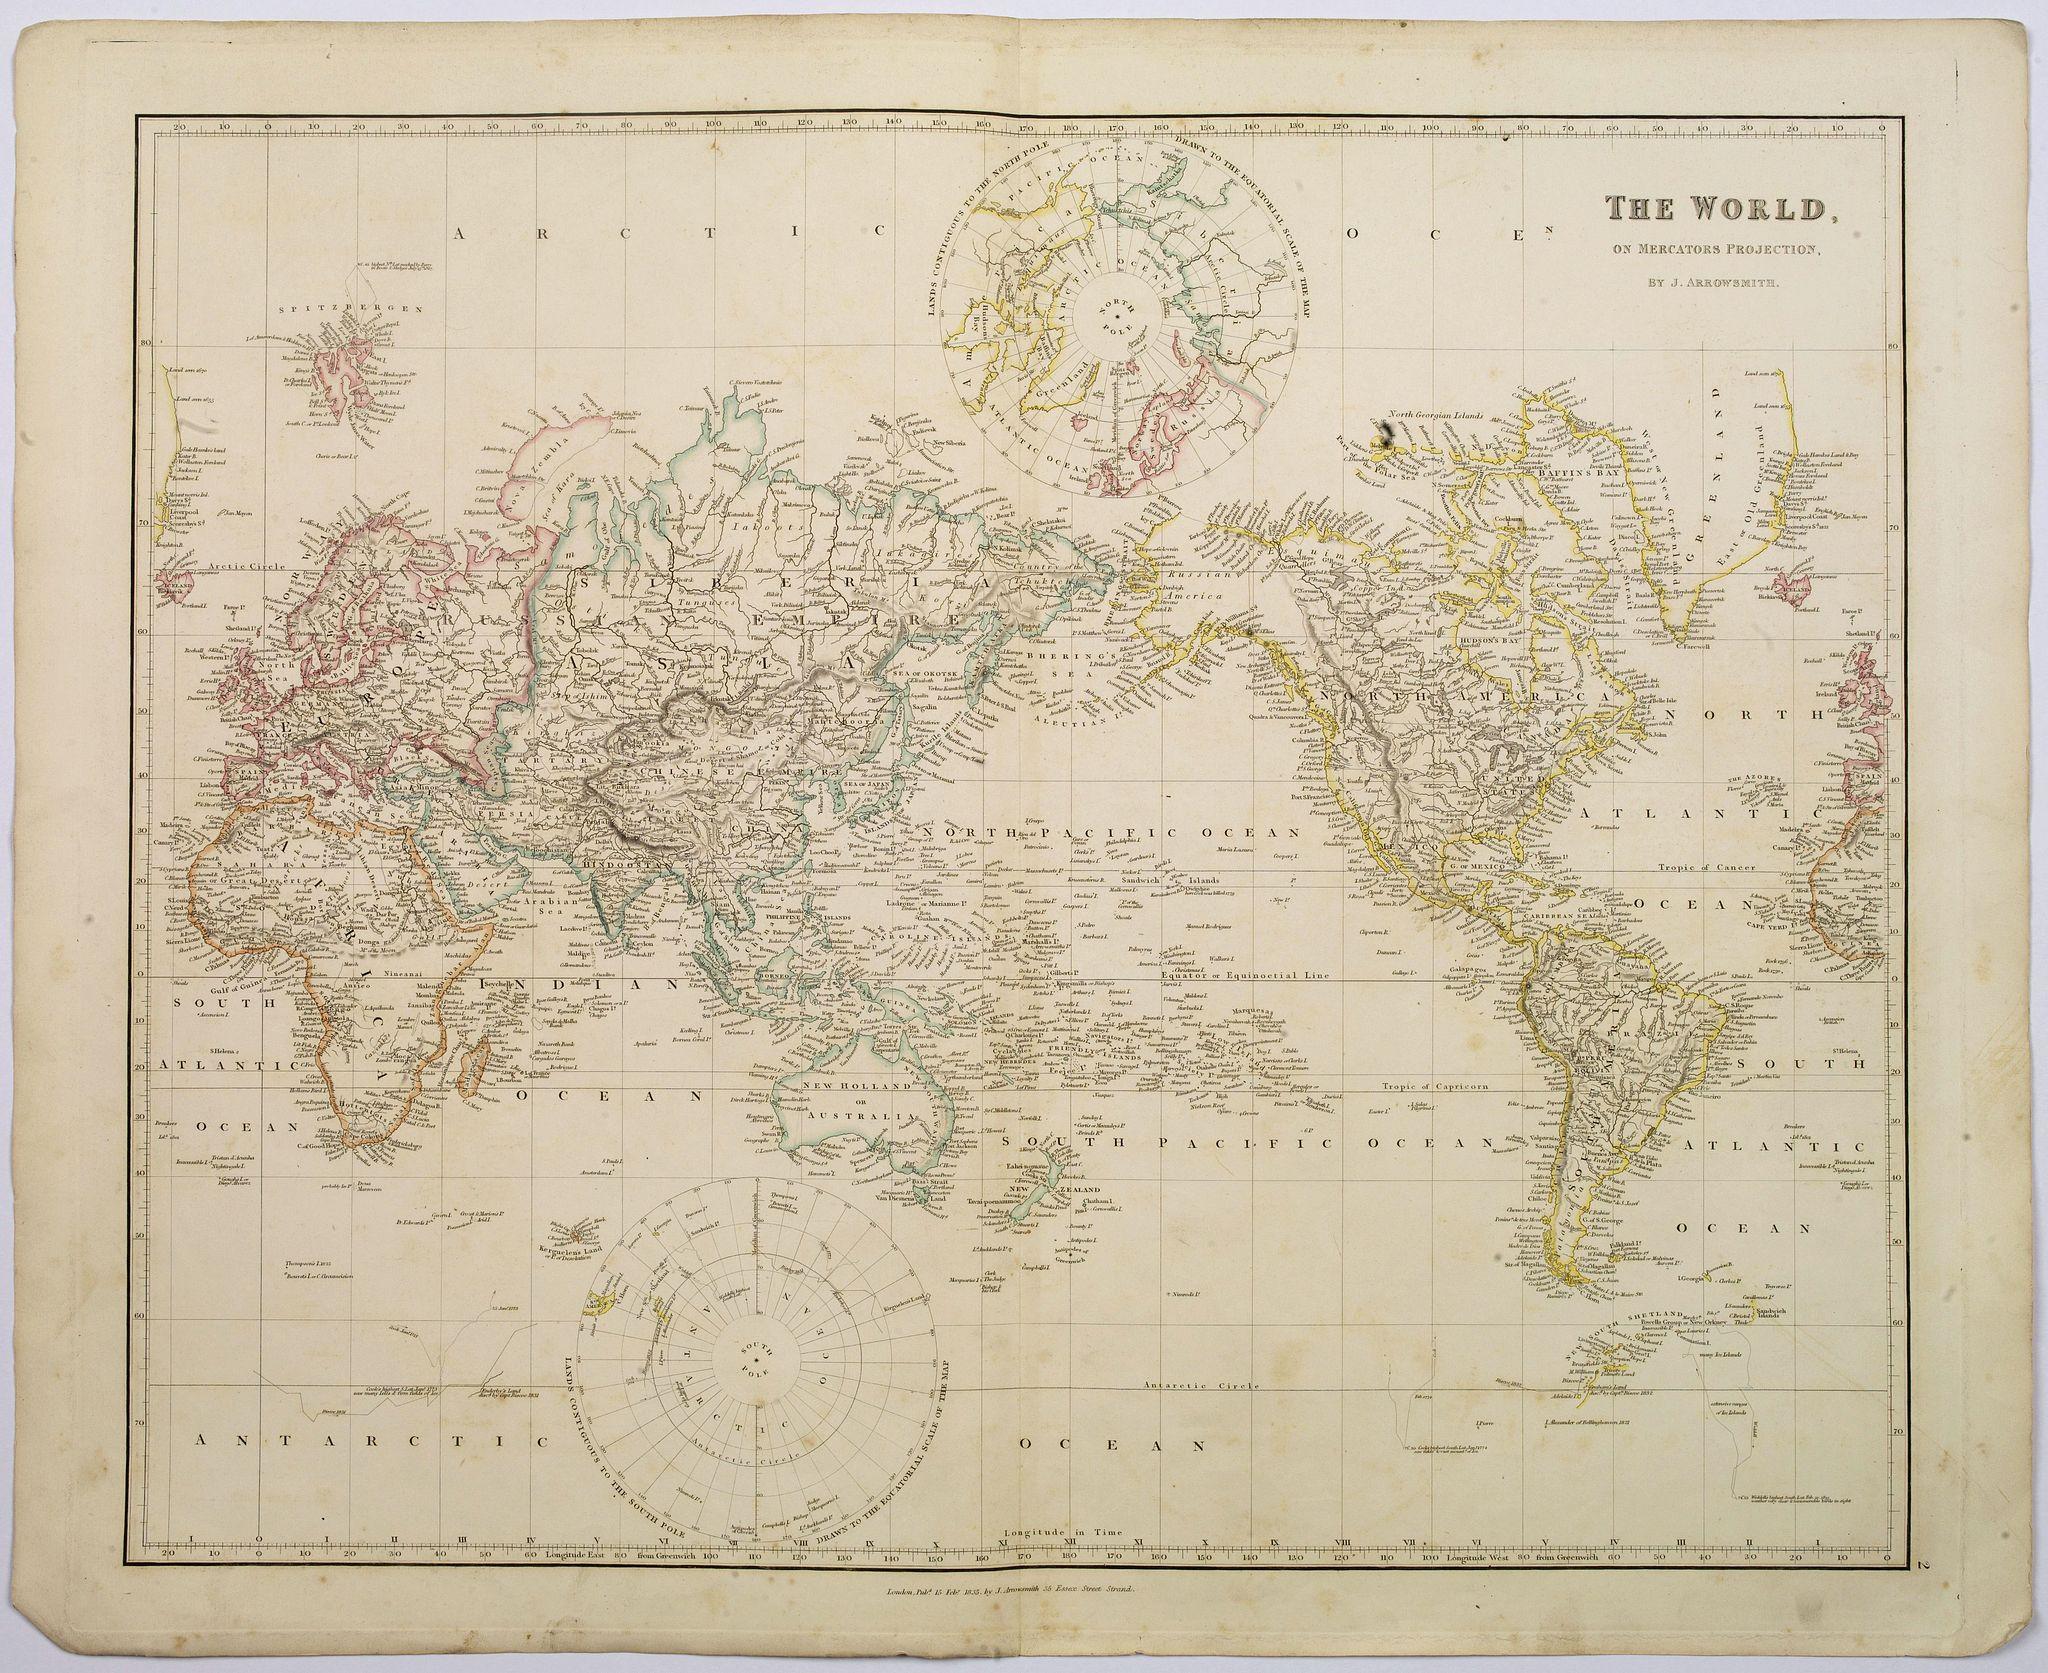 ARROWSMITH, John -  The World on Mercator's Projection.